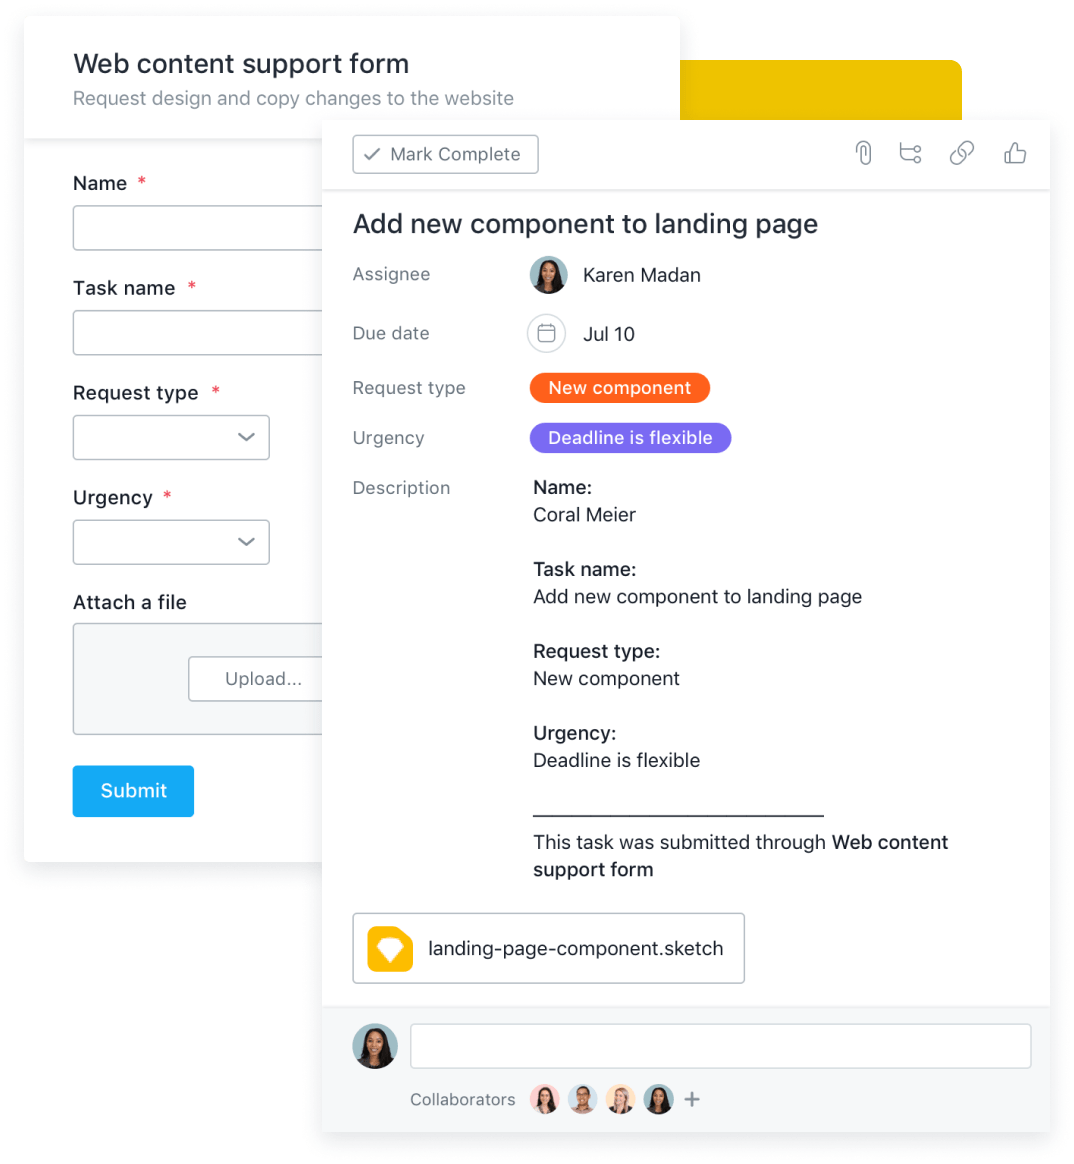 Organize requests